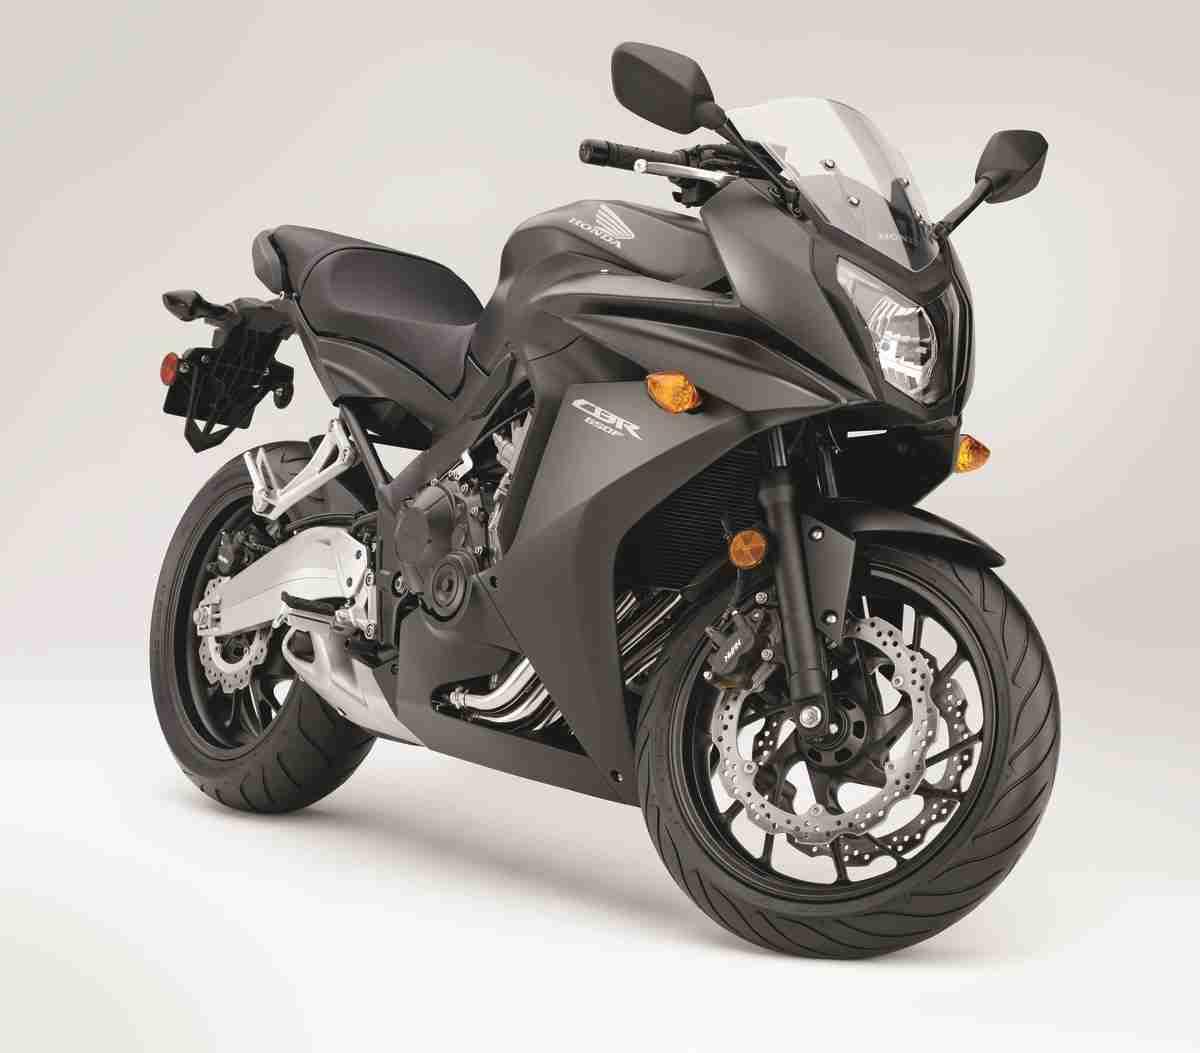 Honda CBR 650F India black colour option